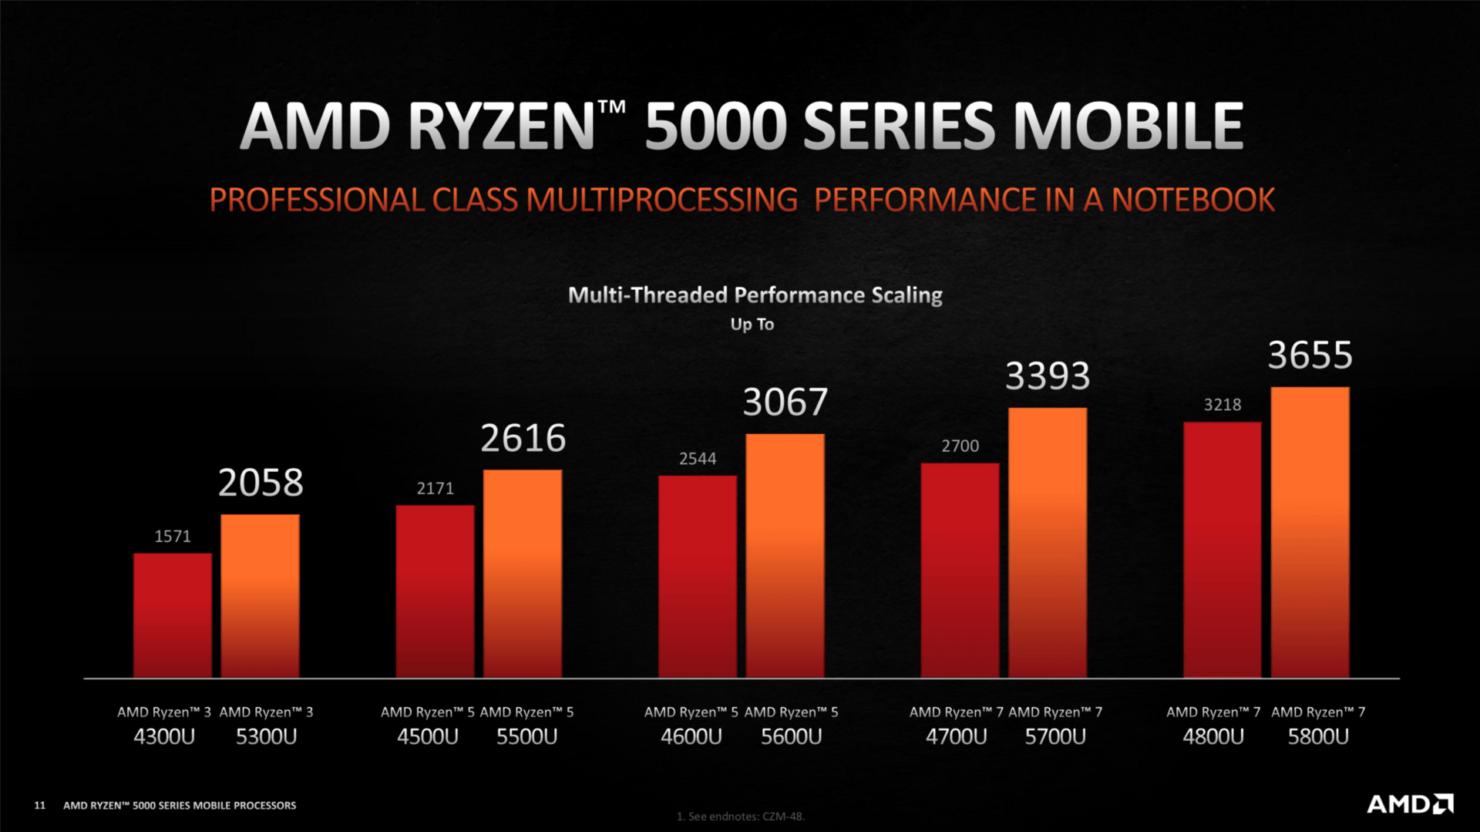 Sforum - AMD-Ryzen-5000-Zen-3-Notebook-CPUs-Cezanne-Lucienne-_2-1480x832-1 AMD Ryzen 5000 Mobile Series: Very Powerful, Supports Overlocking, But Beware If You Don't Choose Wrong !!!